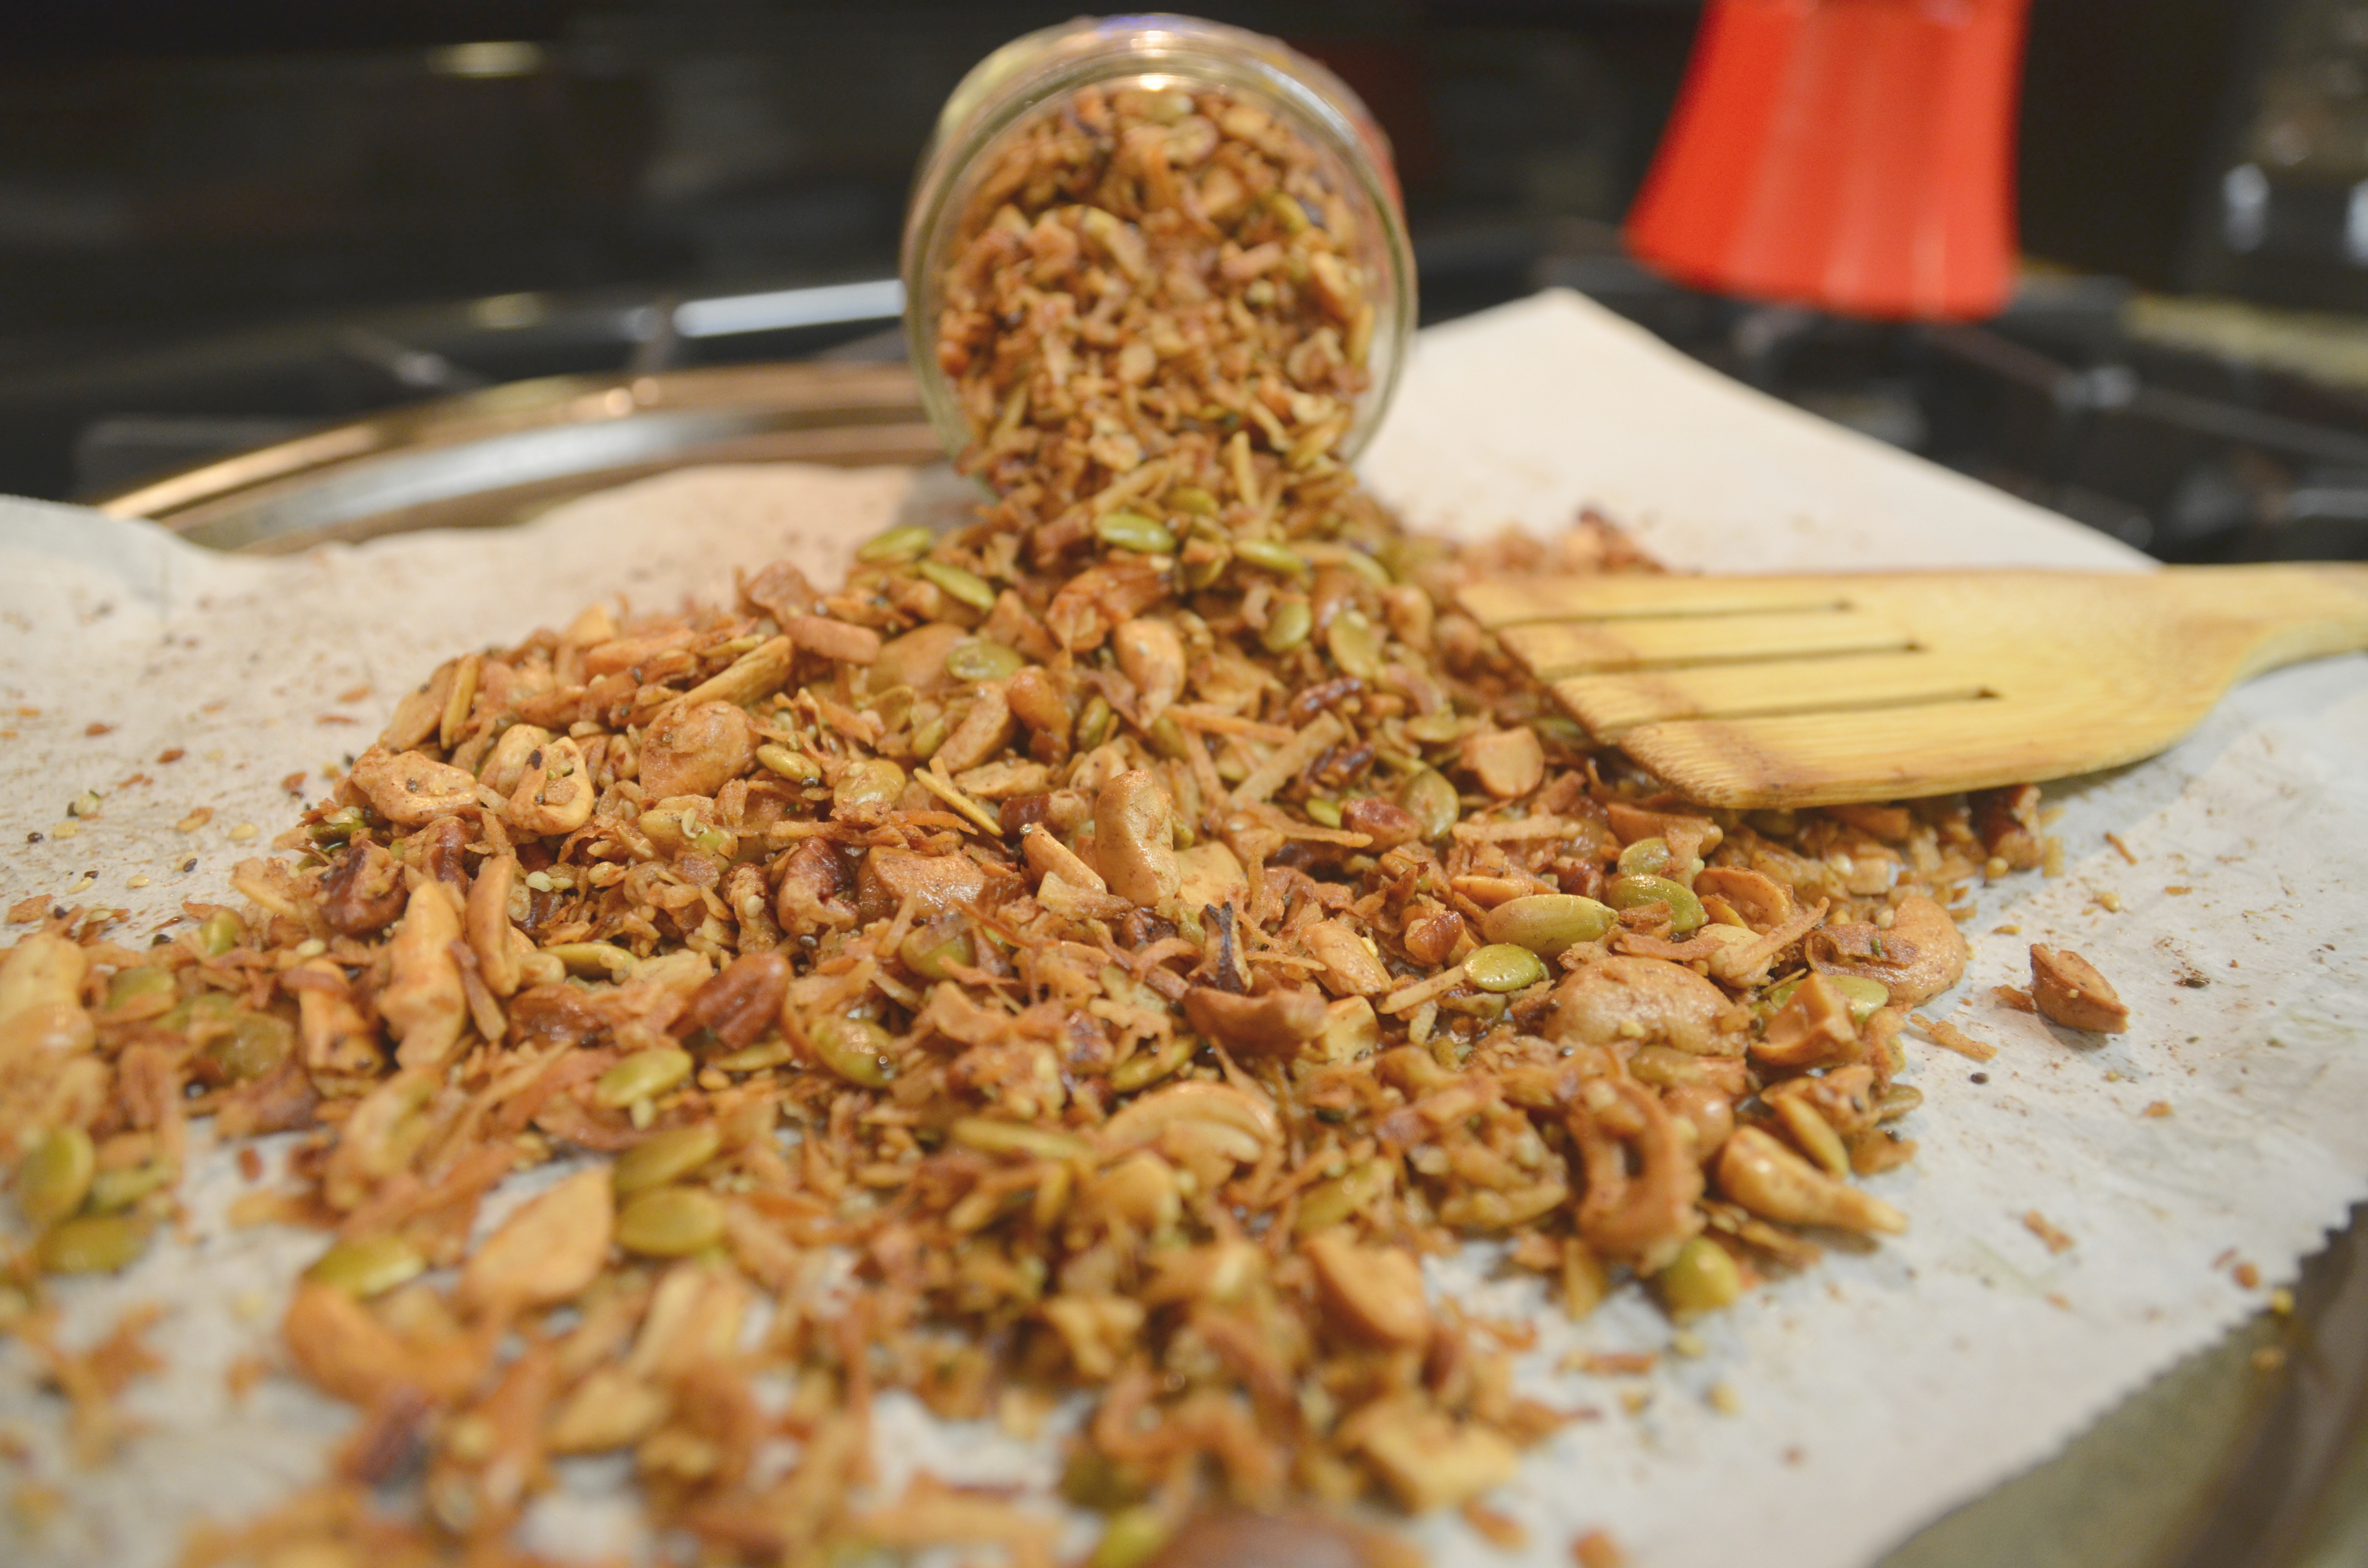 Coconut & cashew Granola